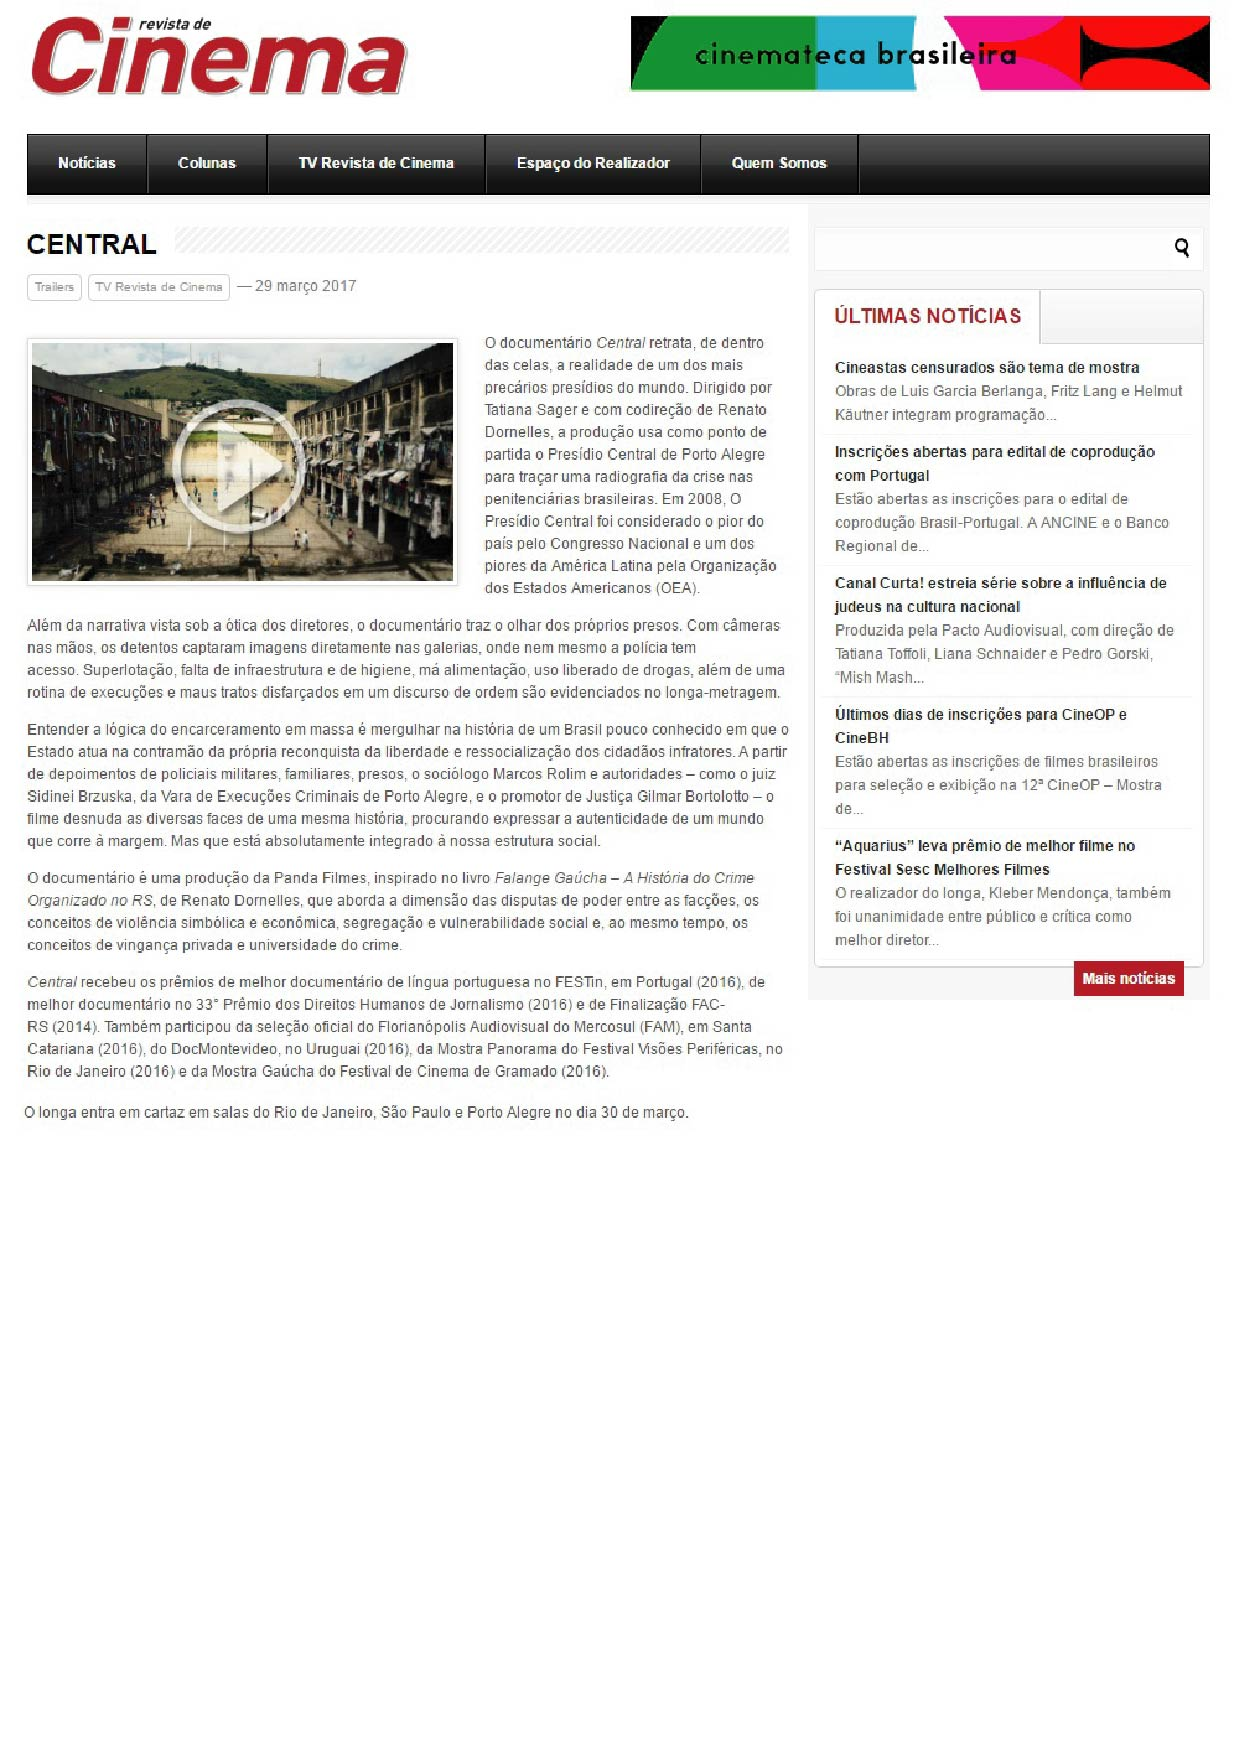 Revista de Cinema |29.03